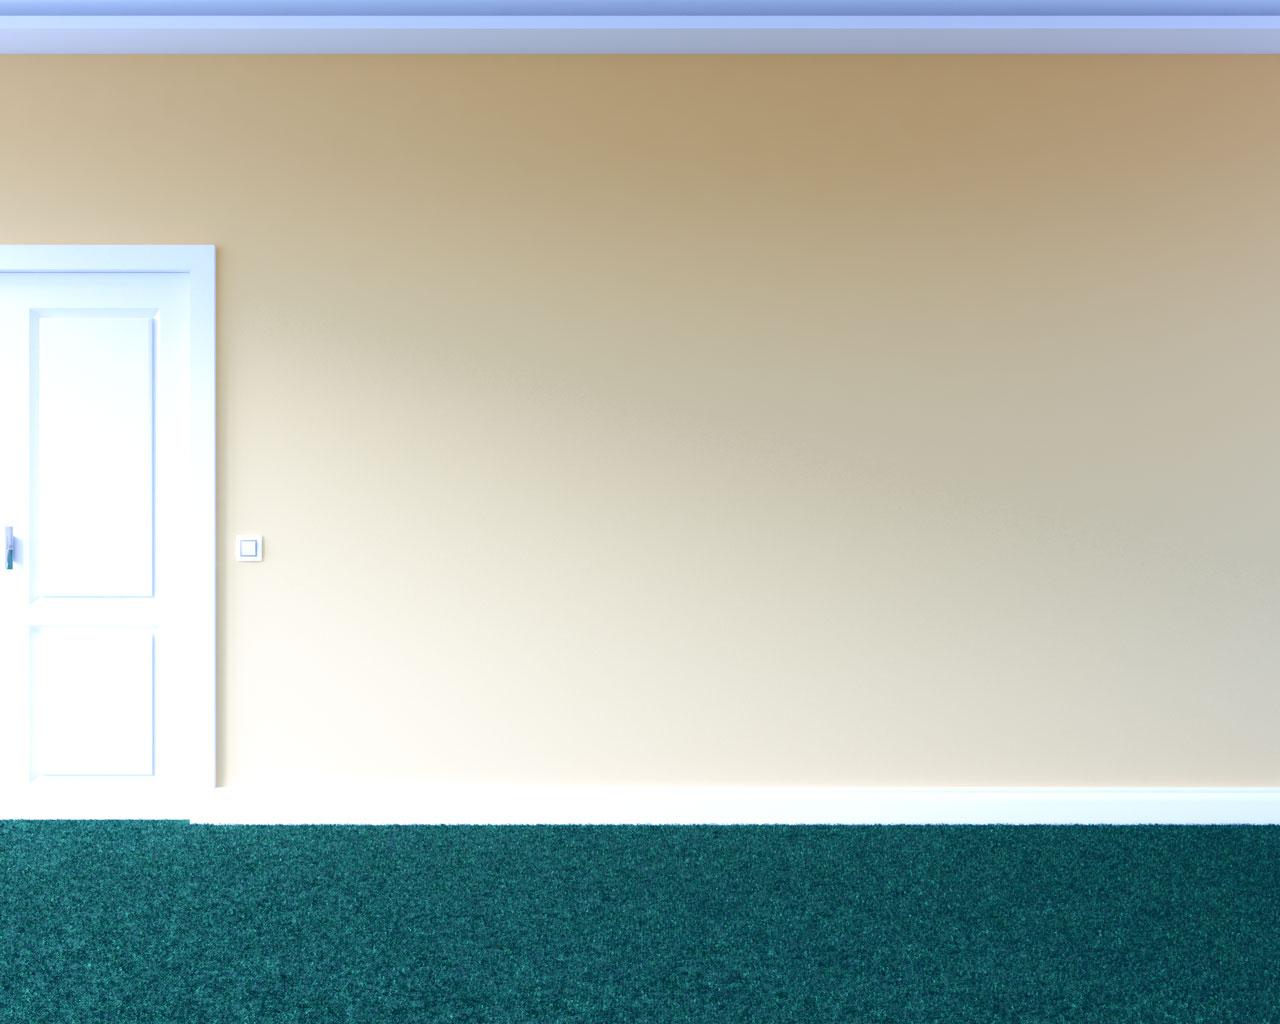 Green carpet with light orange wall